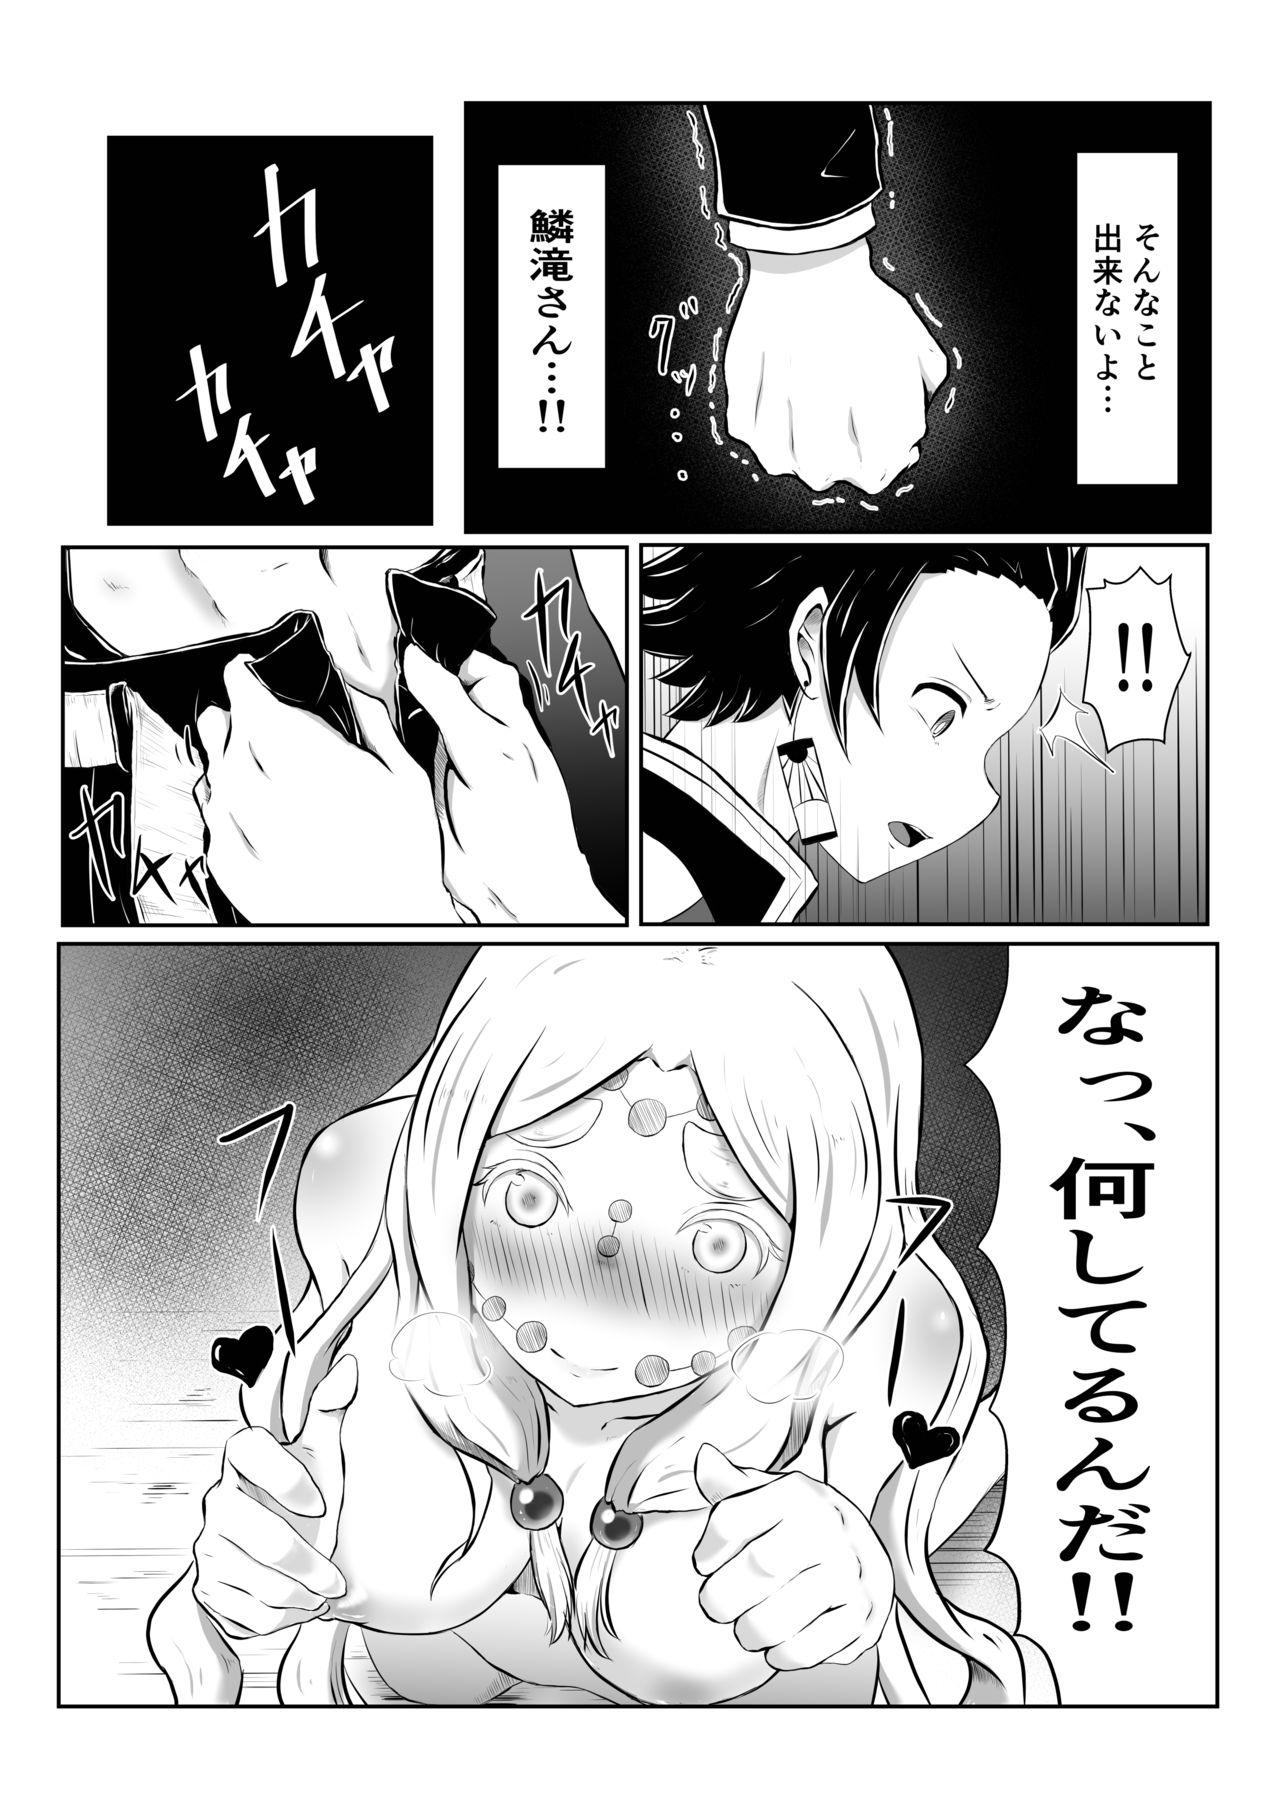 Hinokami Sex. 9